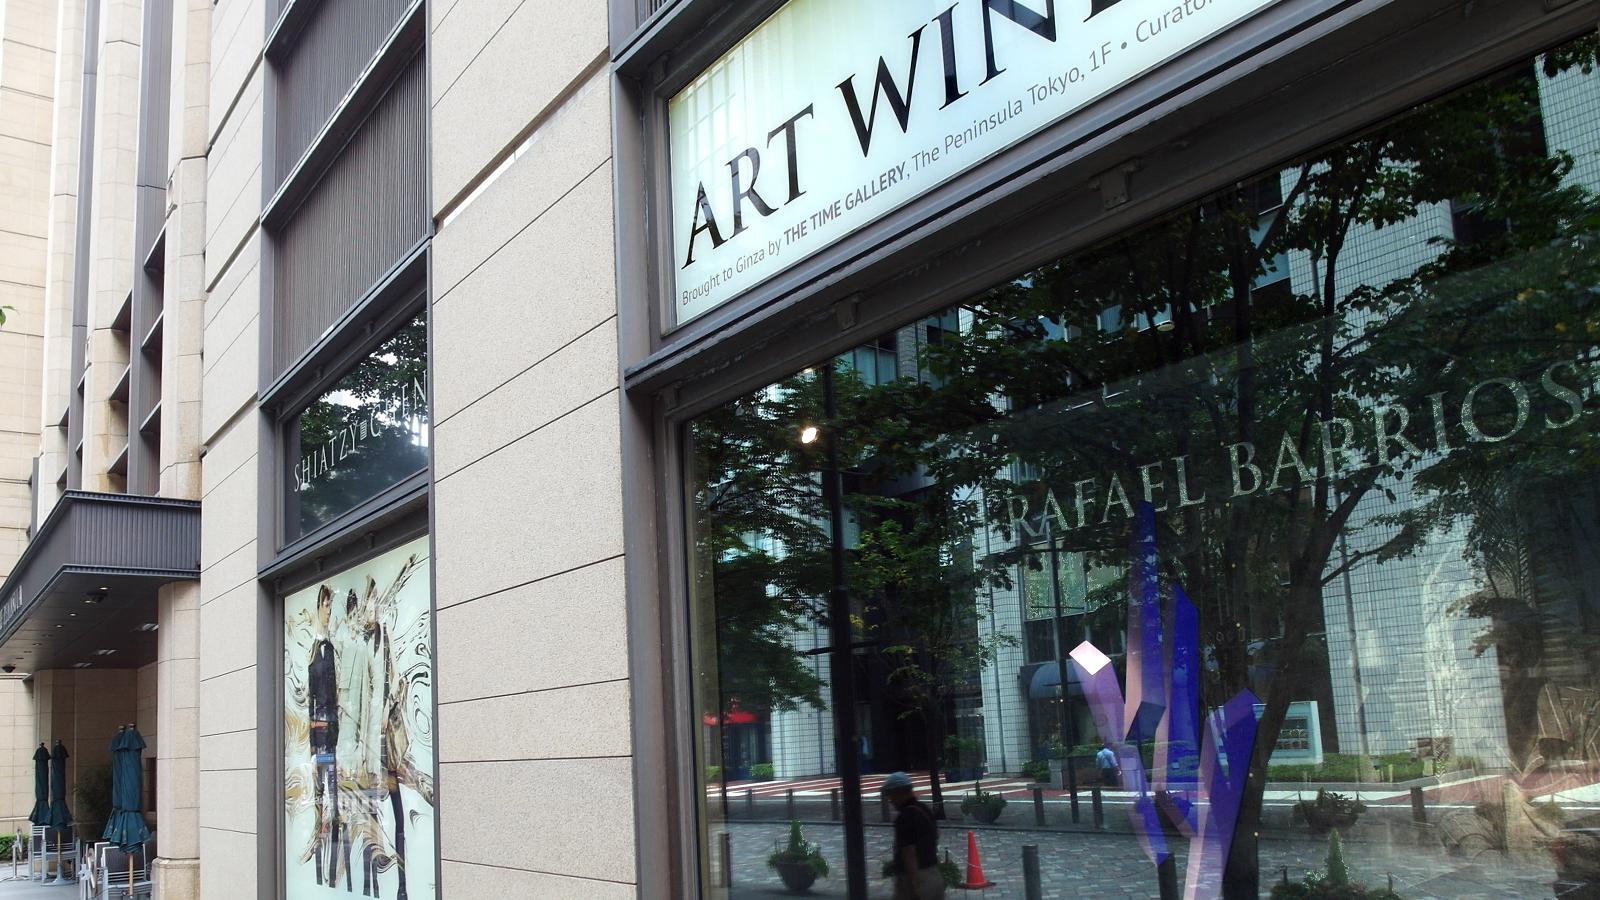 Rafael Barrios Art Window 1